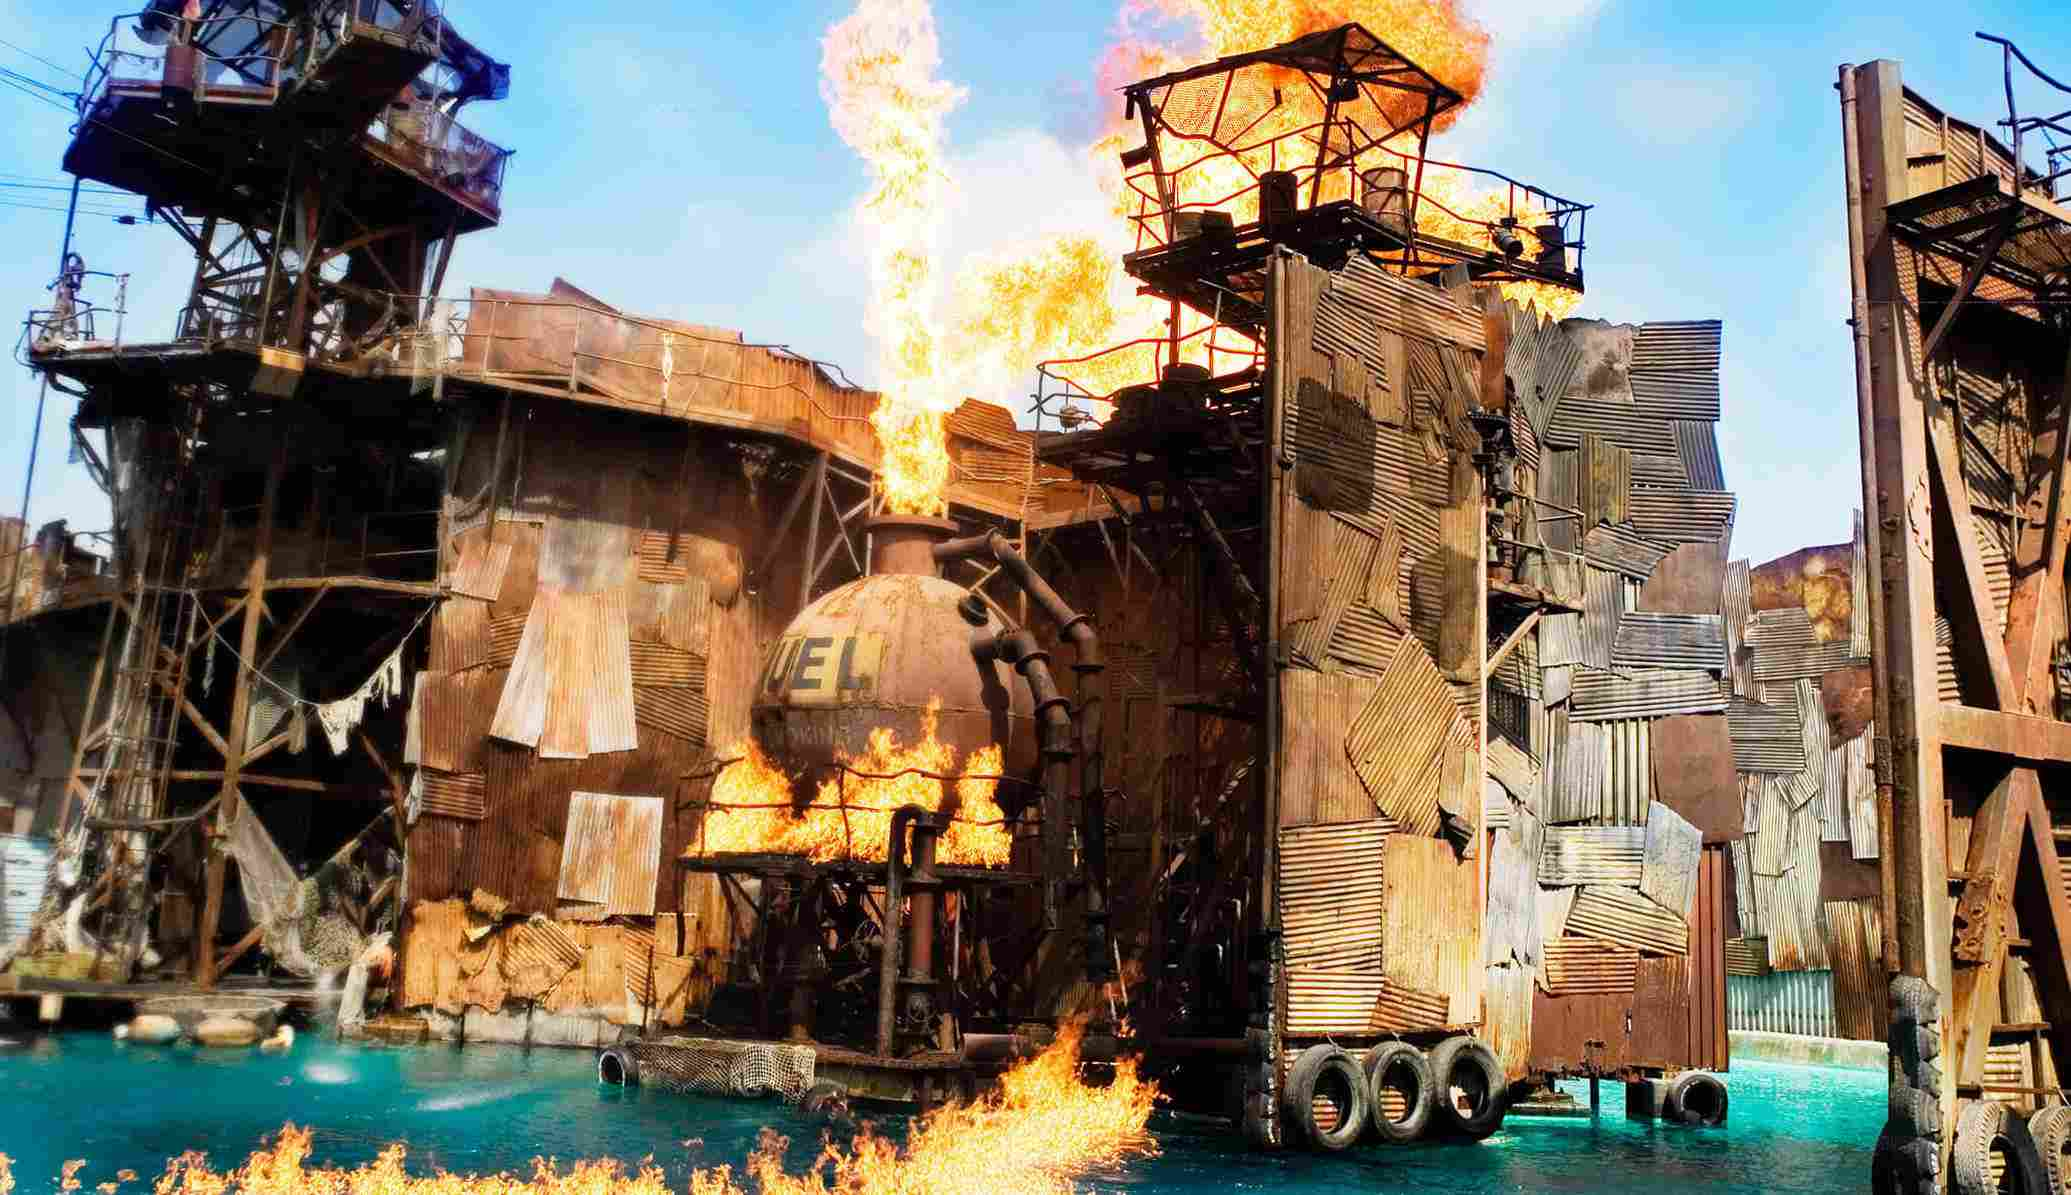 Waterworn show at Universal Studios Hollywood